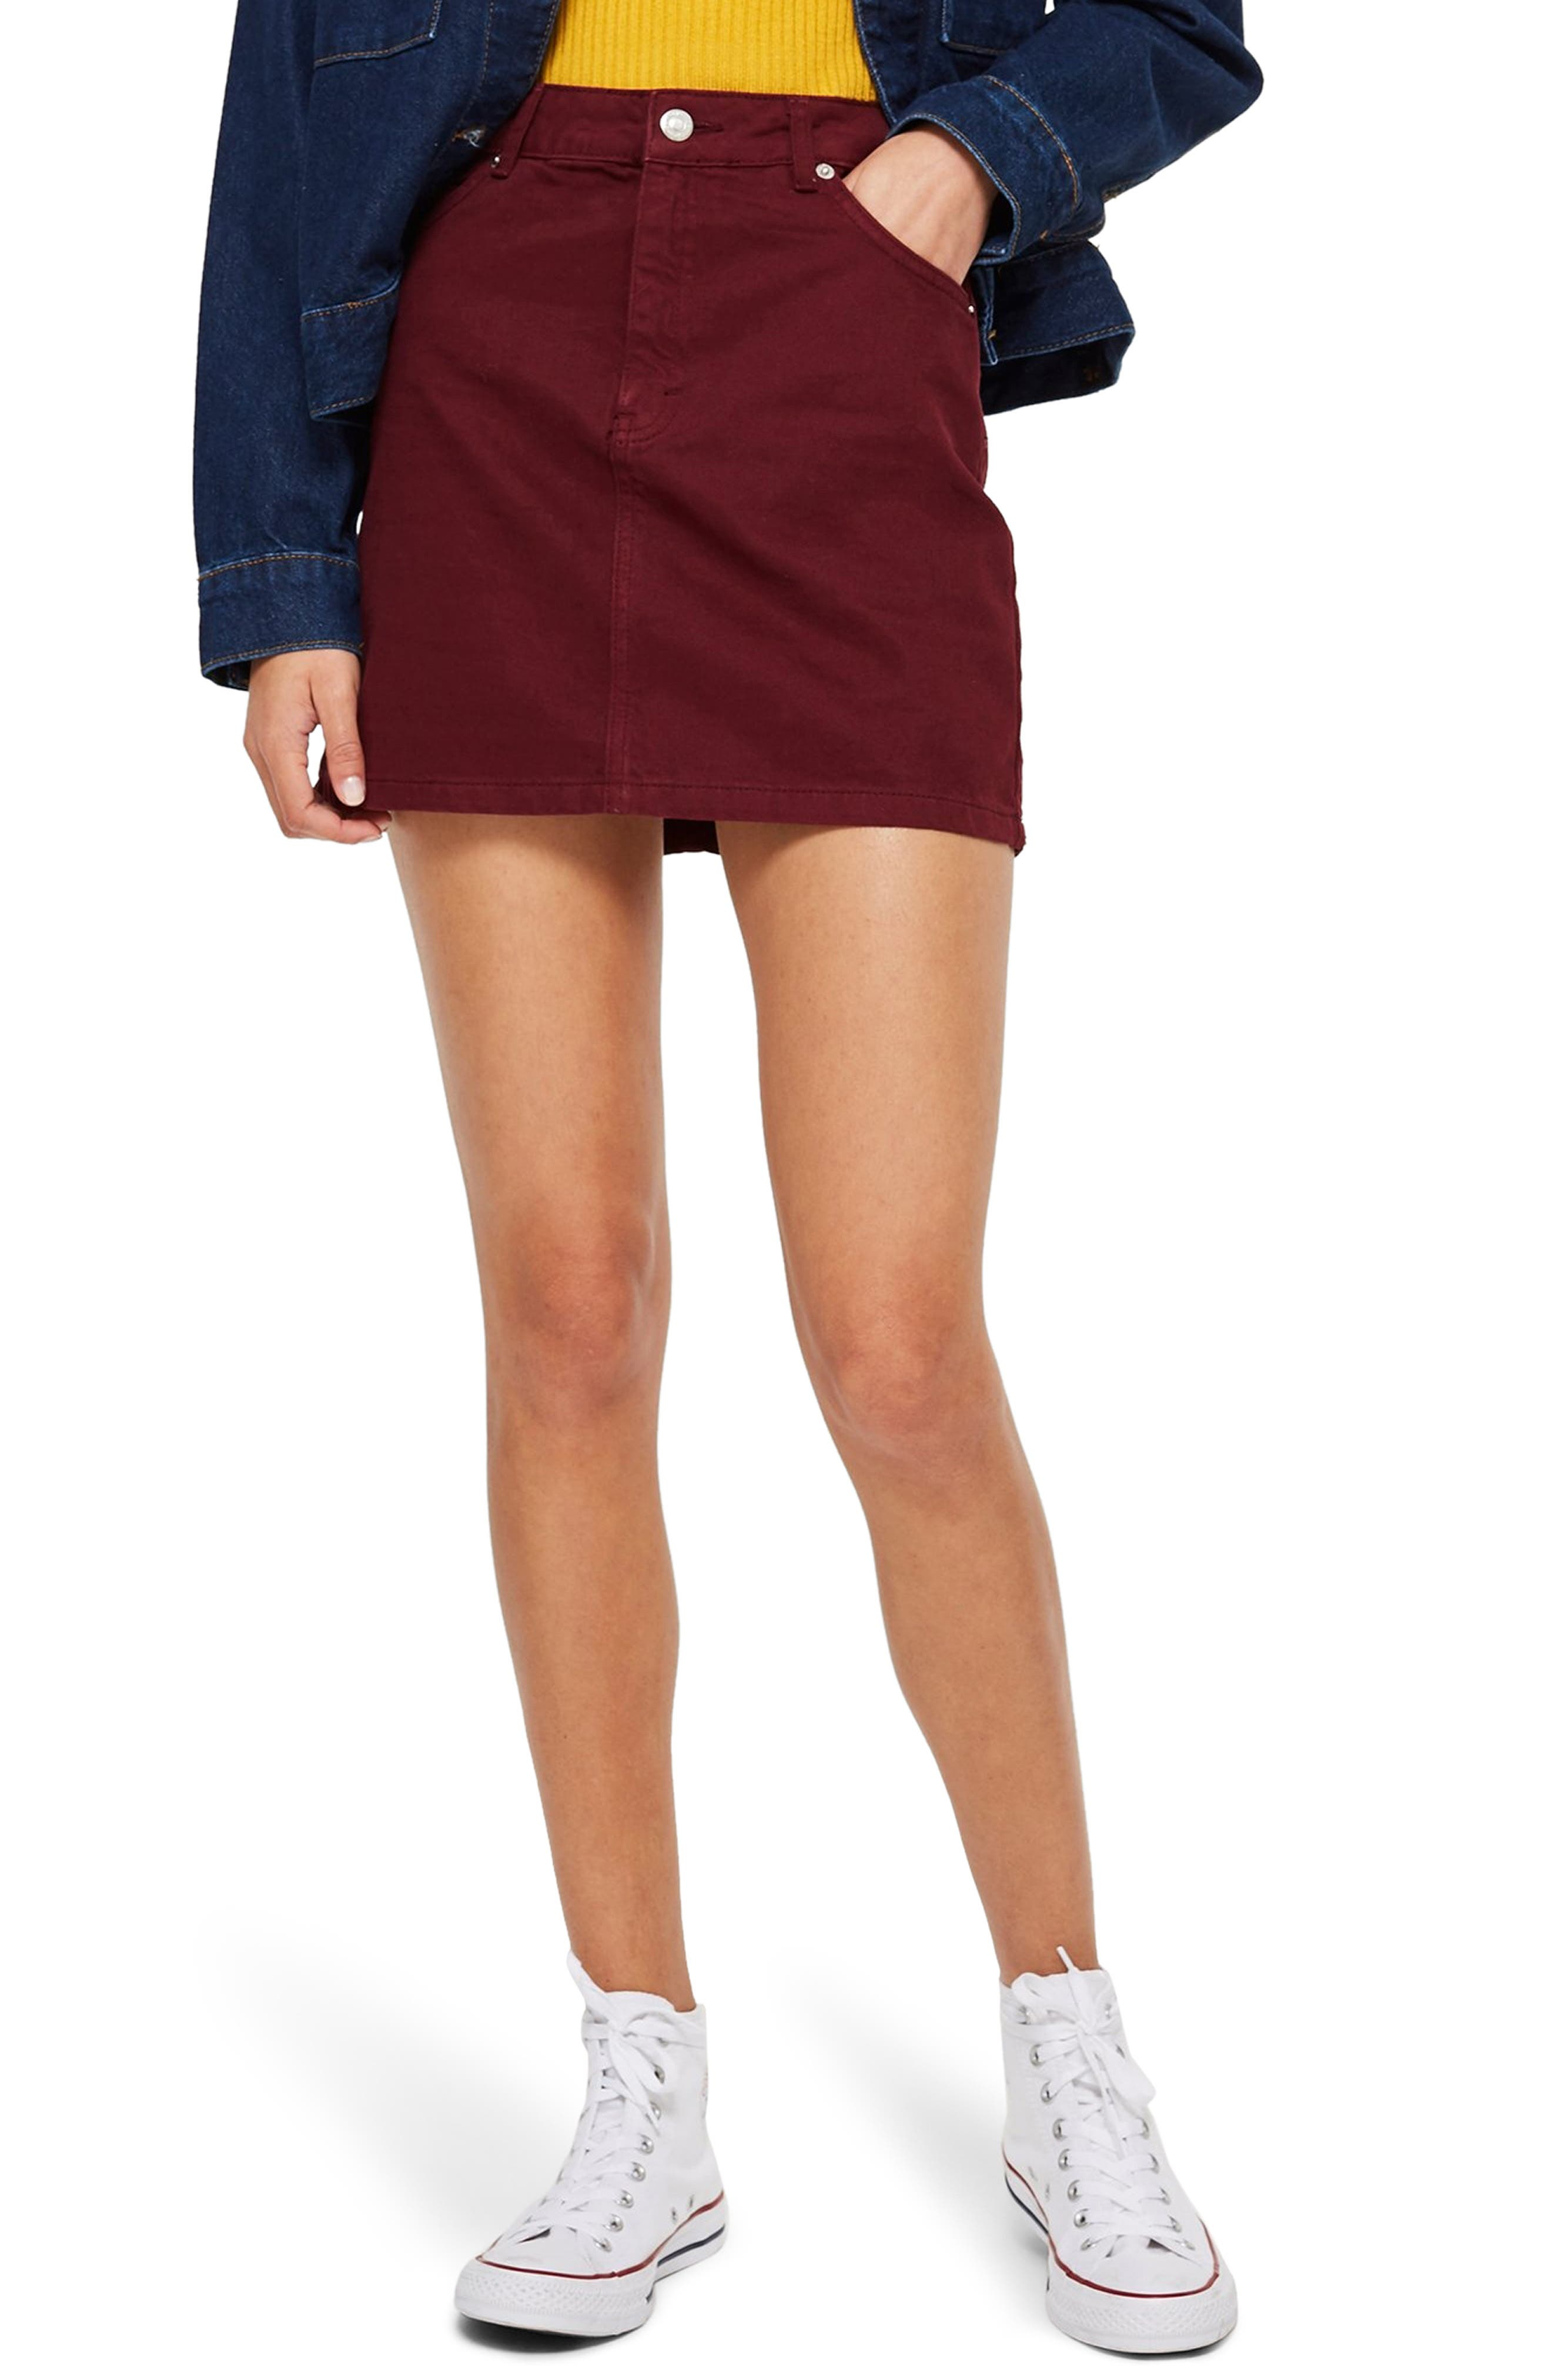 Bordeaux Denim Skirt,                             Main thumbnail 1, color,                             BURGUNDY